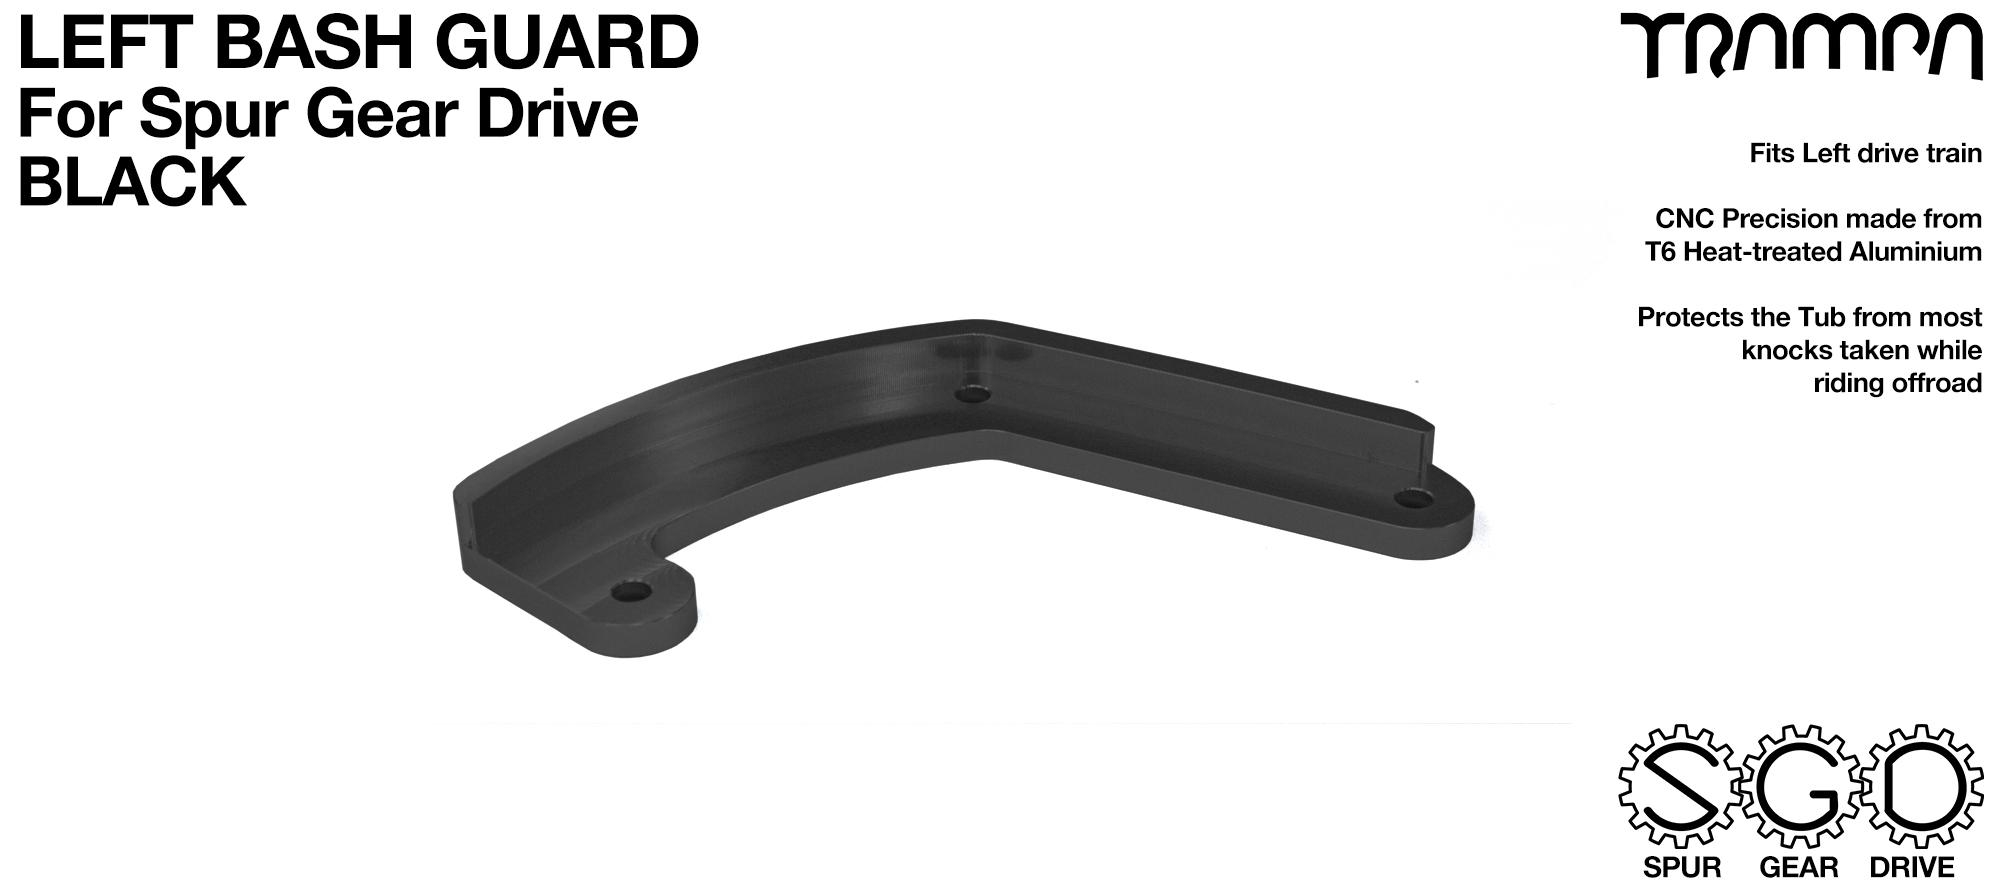 MkII Spur Gear Drive Bash Guard - LEFT Side - BLACK